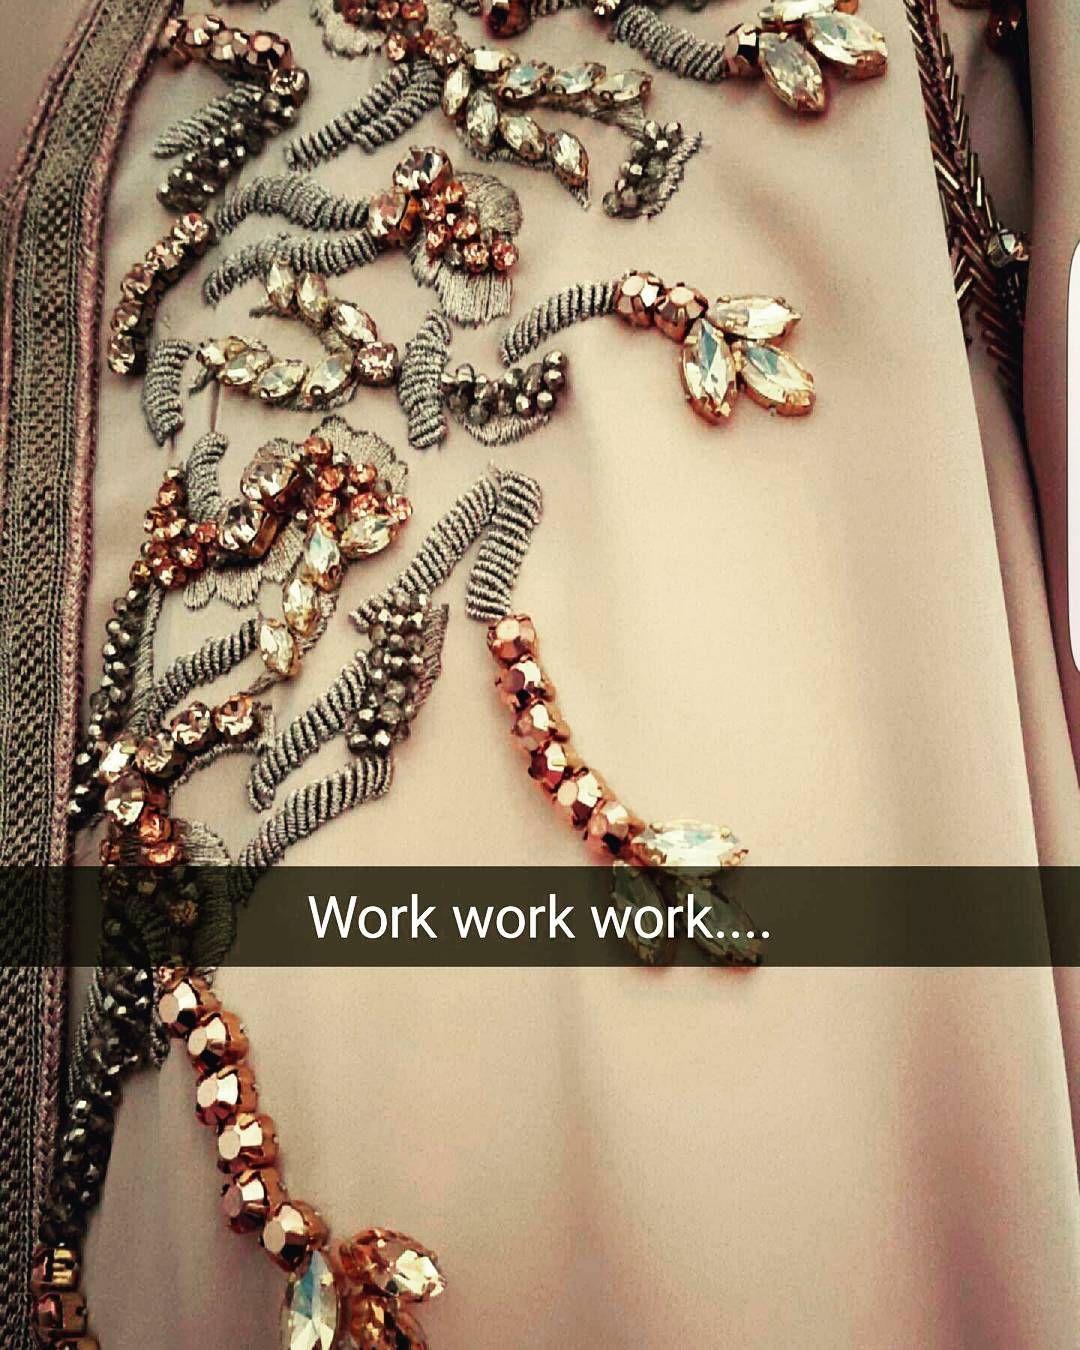 work embroidery handmade bronze rosegold creation details design caftan   fes Morrocco eed306a04e9